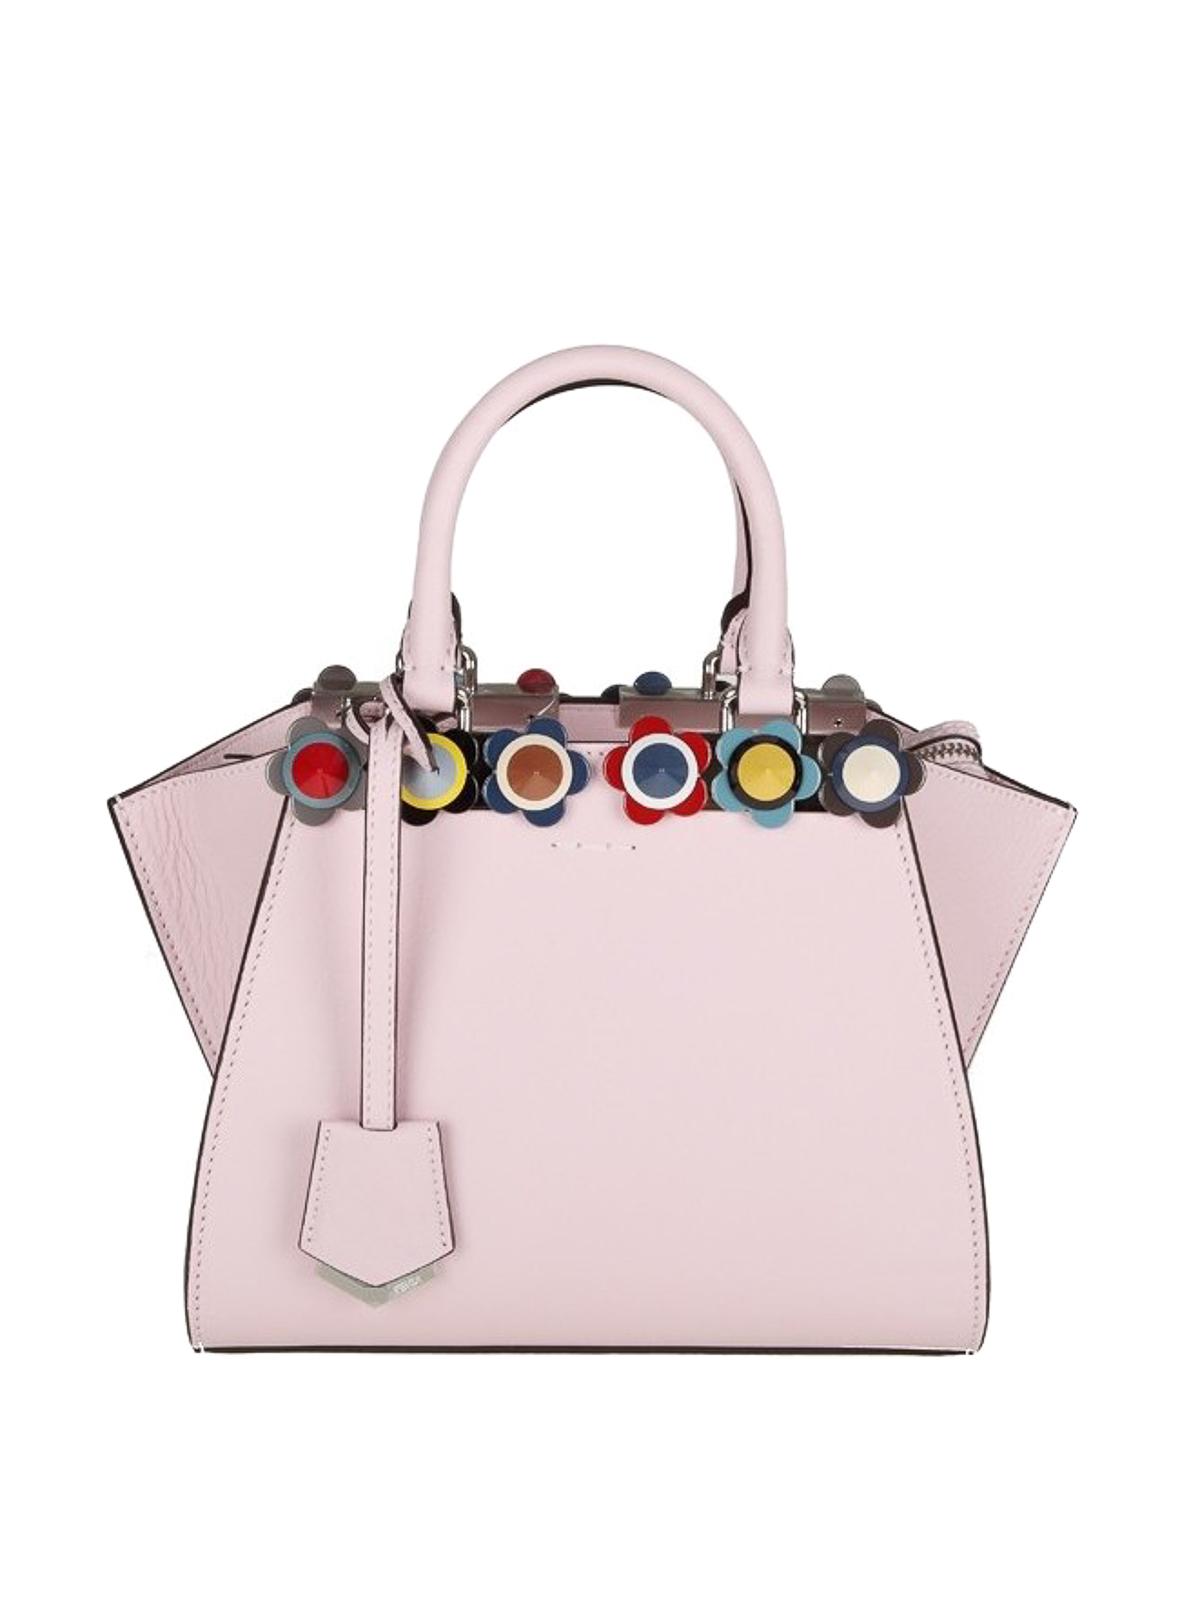 9365a706c95 Fendi - 3 Jours Flowerland stud pink mini tote - totes bags ...